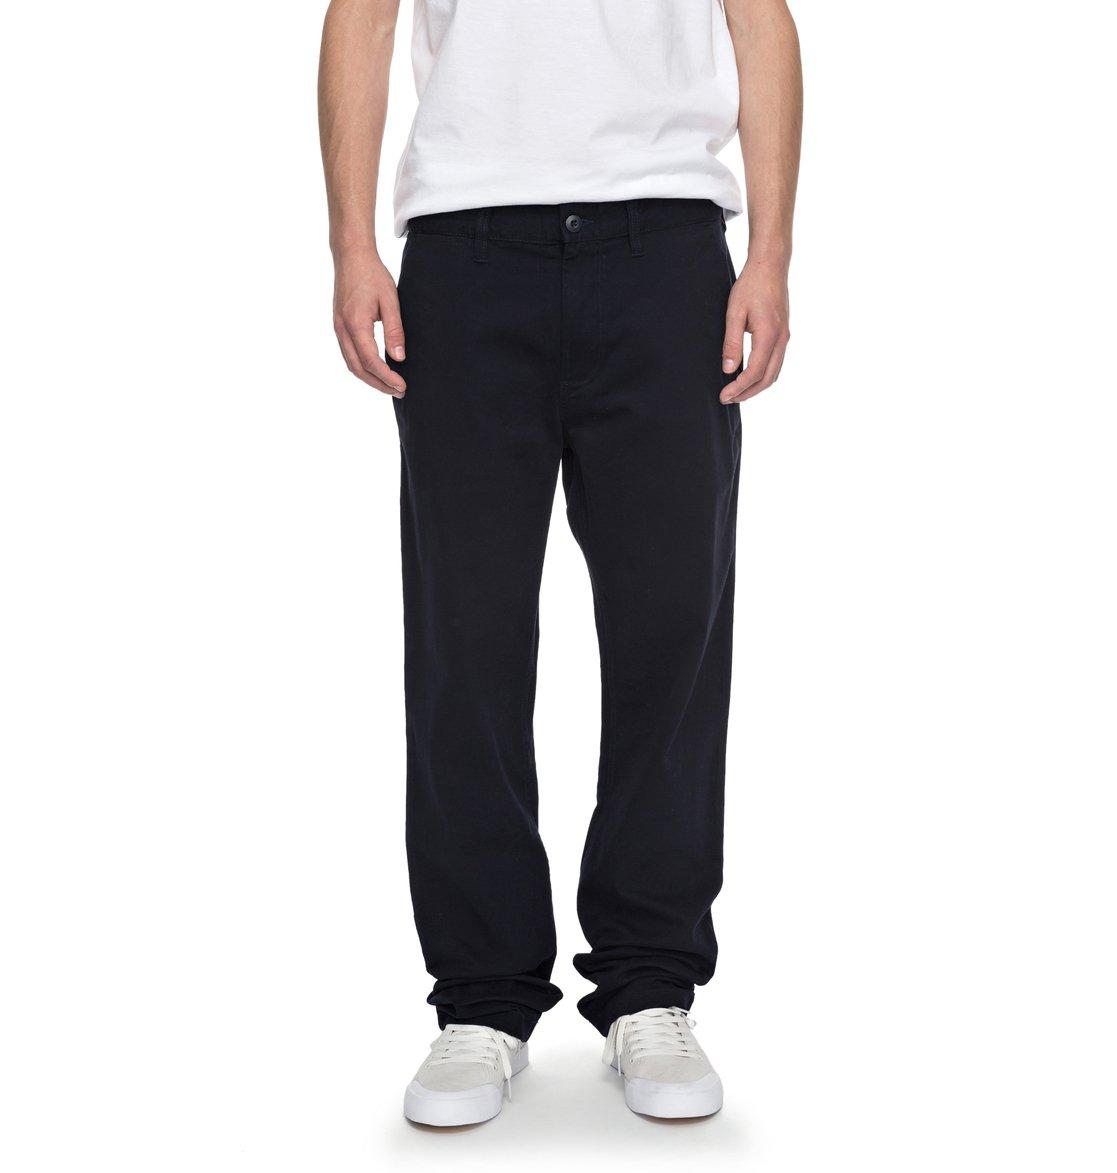 dc shoes Worker 32 - Pantaloni Chino da Uomo - Blue - DC Shoes